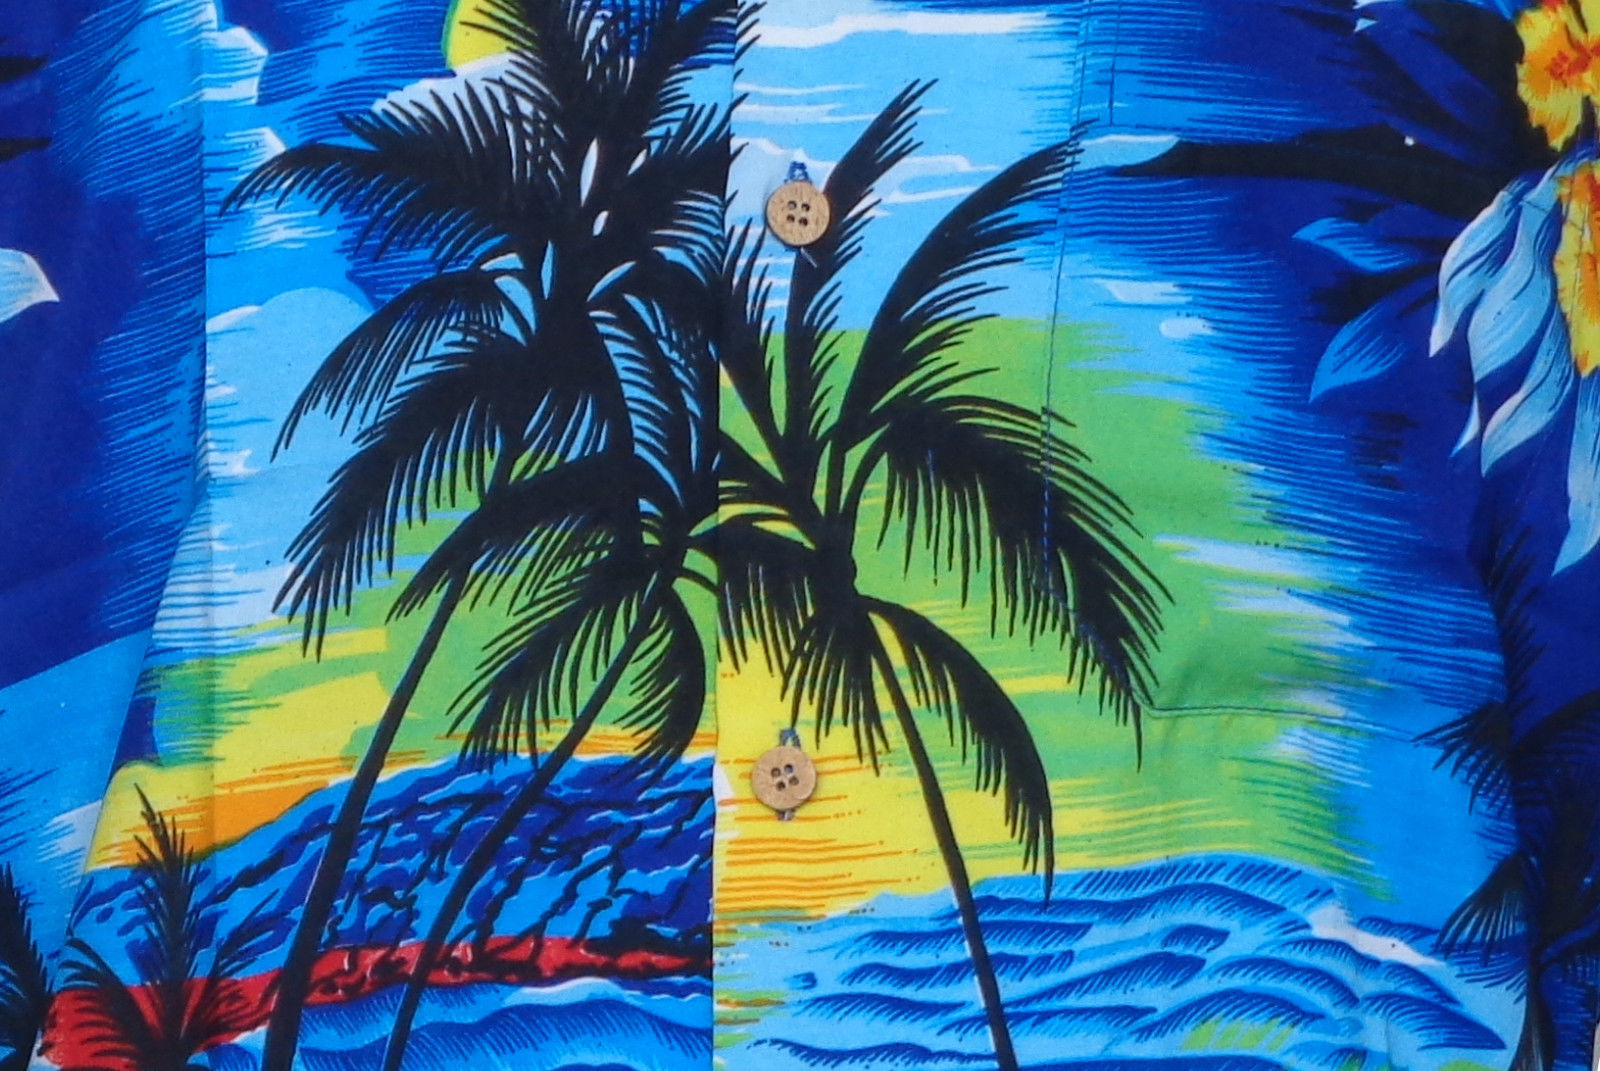 Hawaiian-Shirt-Mens-Allover-Print-Beach-Camp-Party-Aloha-Beach-Holiday-Camp thumbnail 8